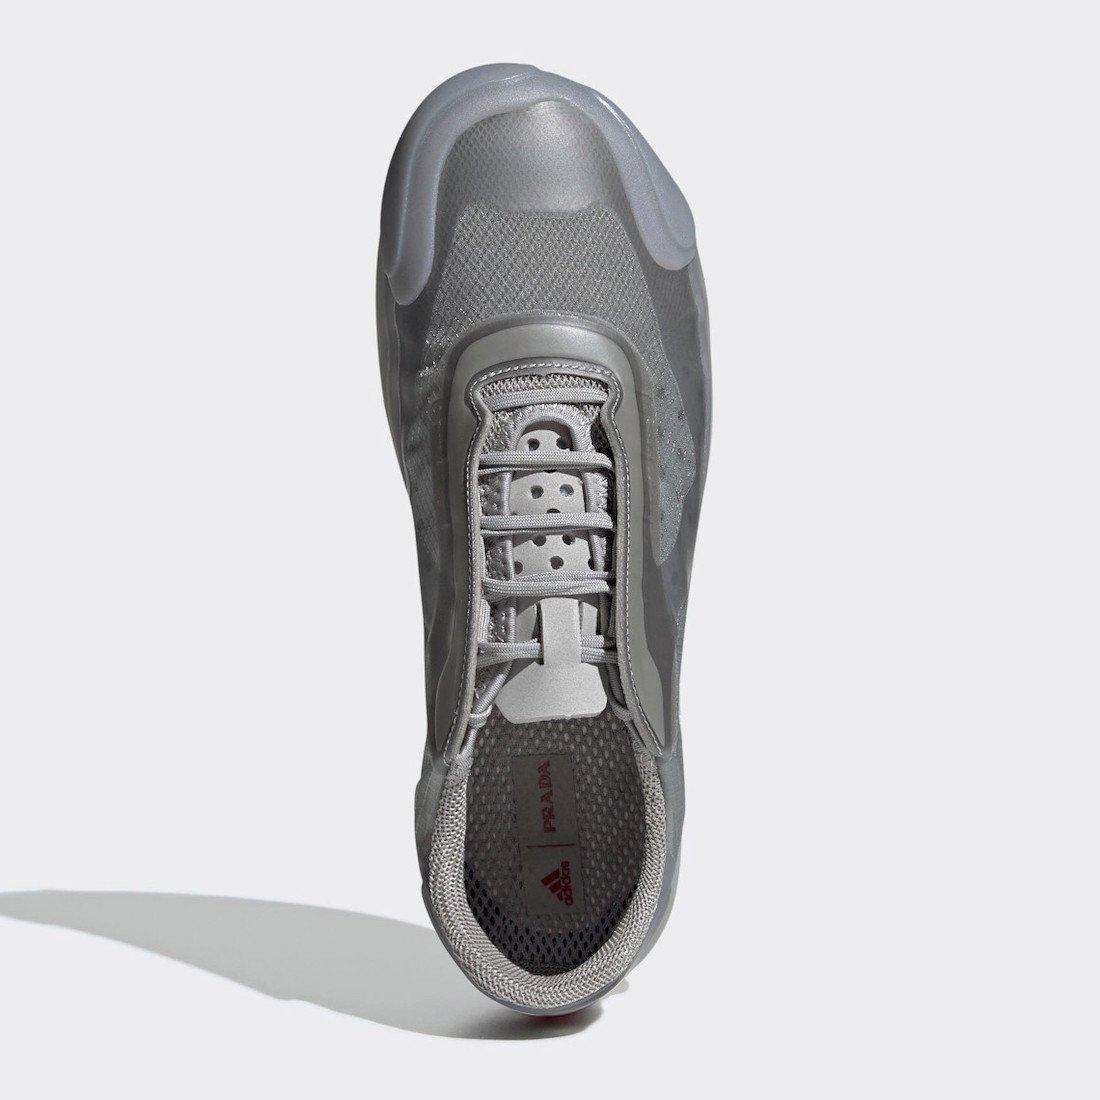 Prada adidas Luna Rossa 21 Silver FW1079 Release Date Info